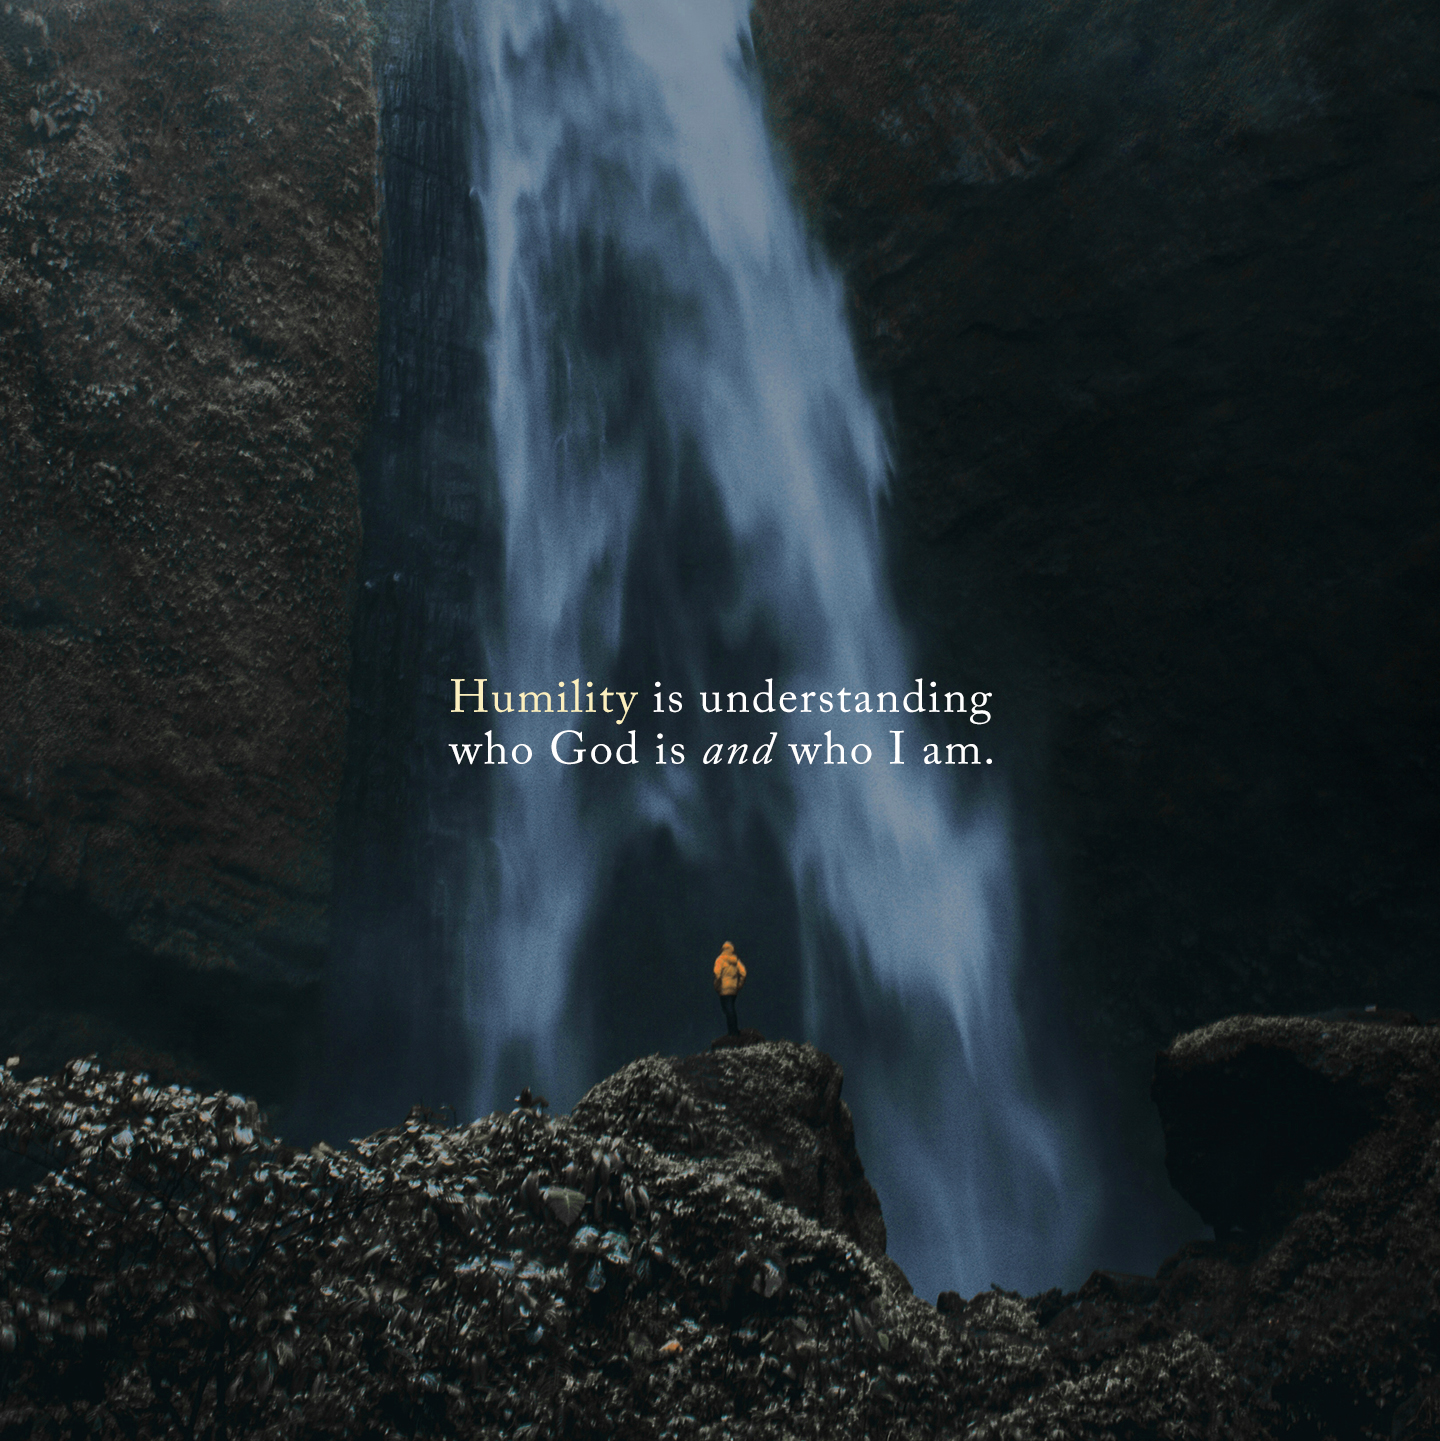 humility_v2.jpg